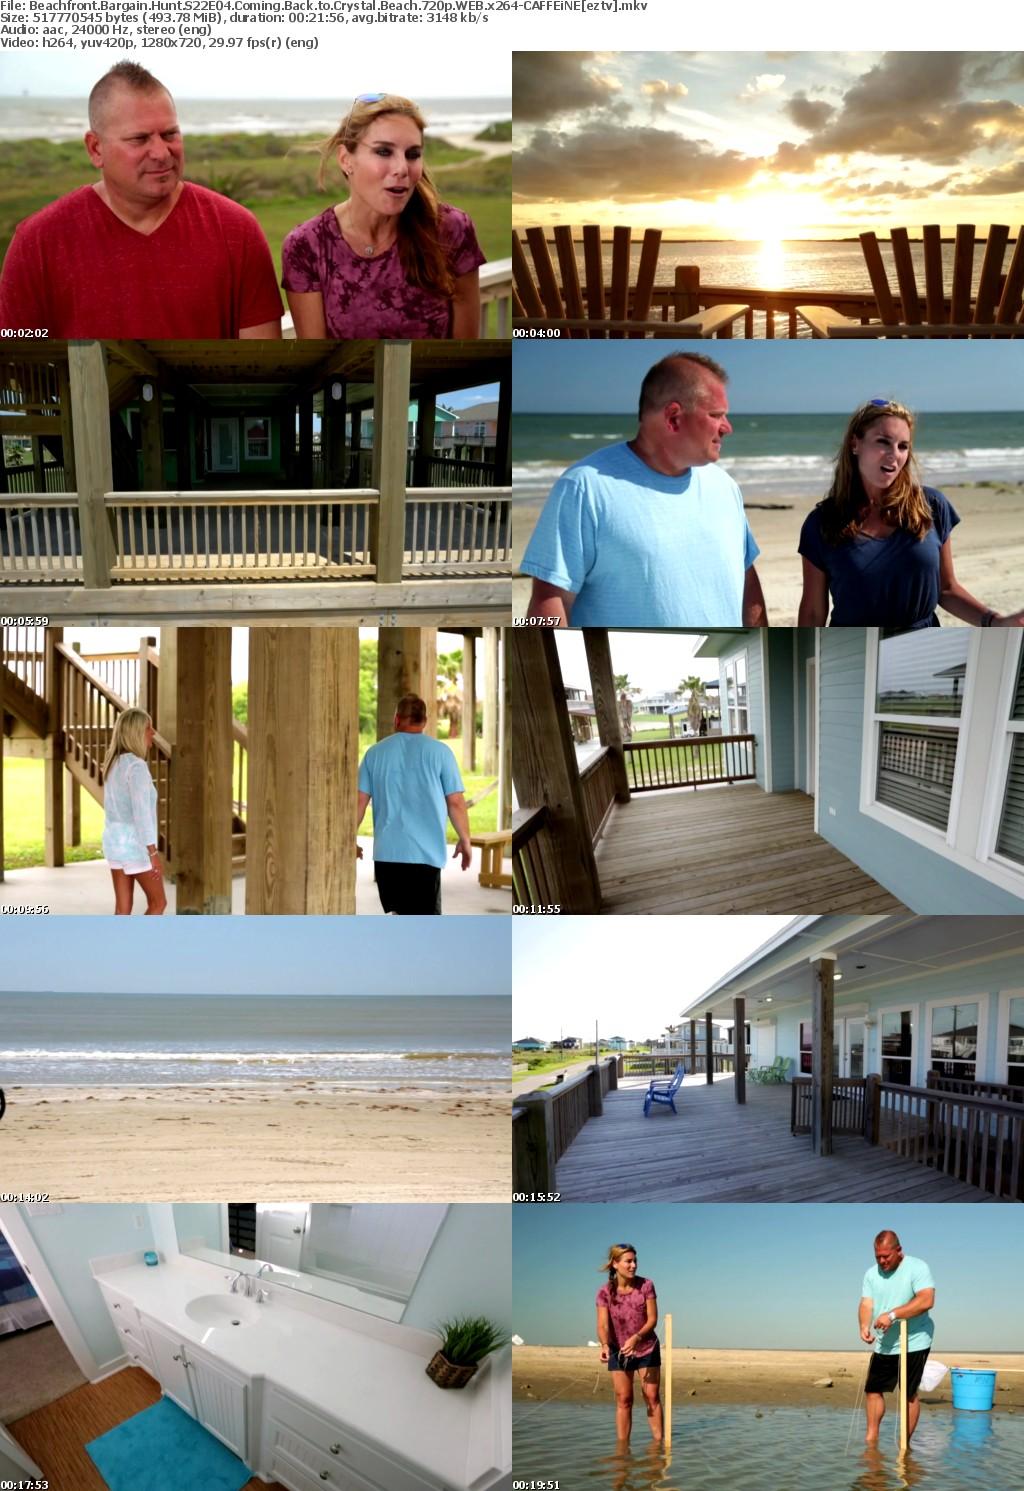 Beachfront Bargain Hunt S22E04 Coming Back to Crystal Beach 720p WEB x264-CAFFEiNE